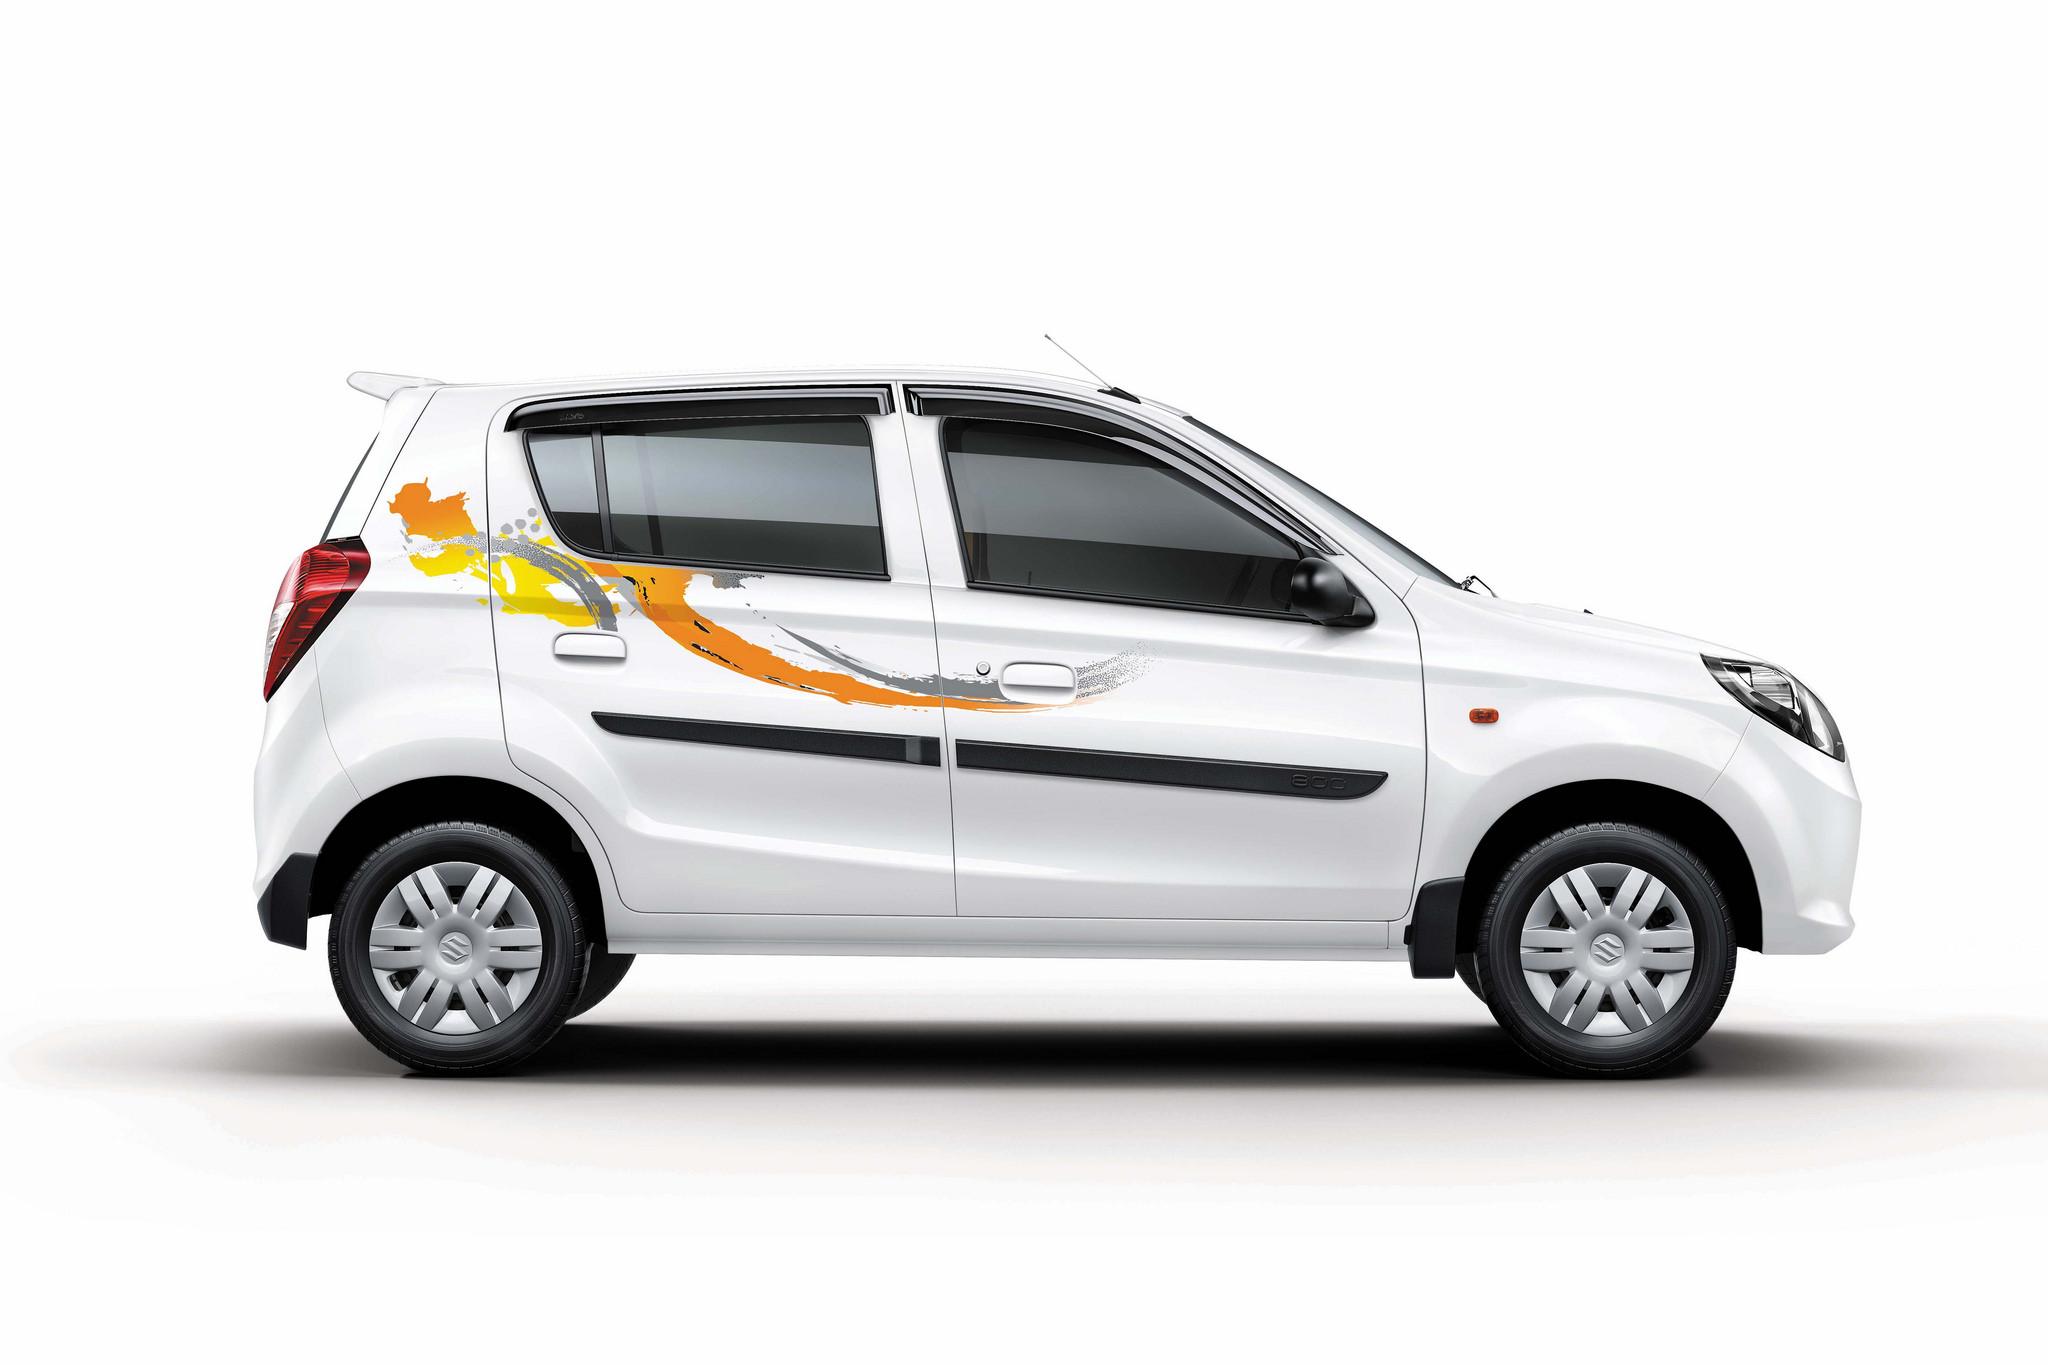 Maruti Alto 800 Onam Edition launched in Kerala [Gallery]